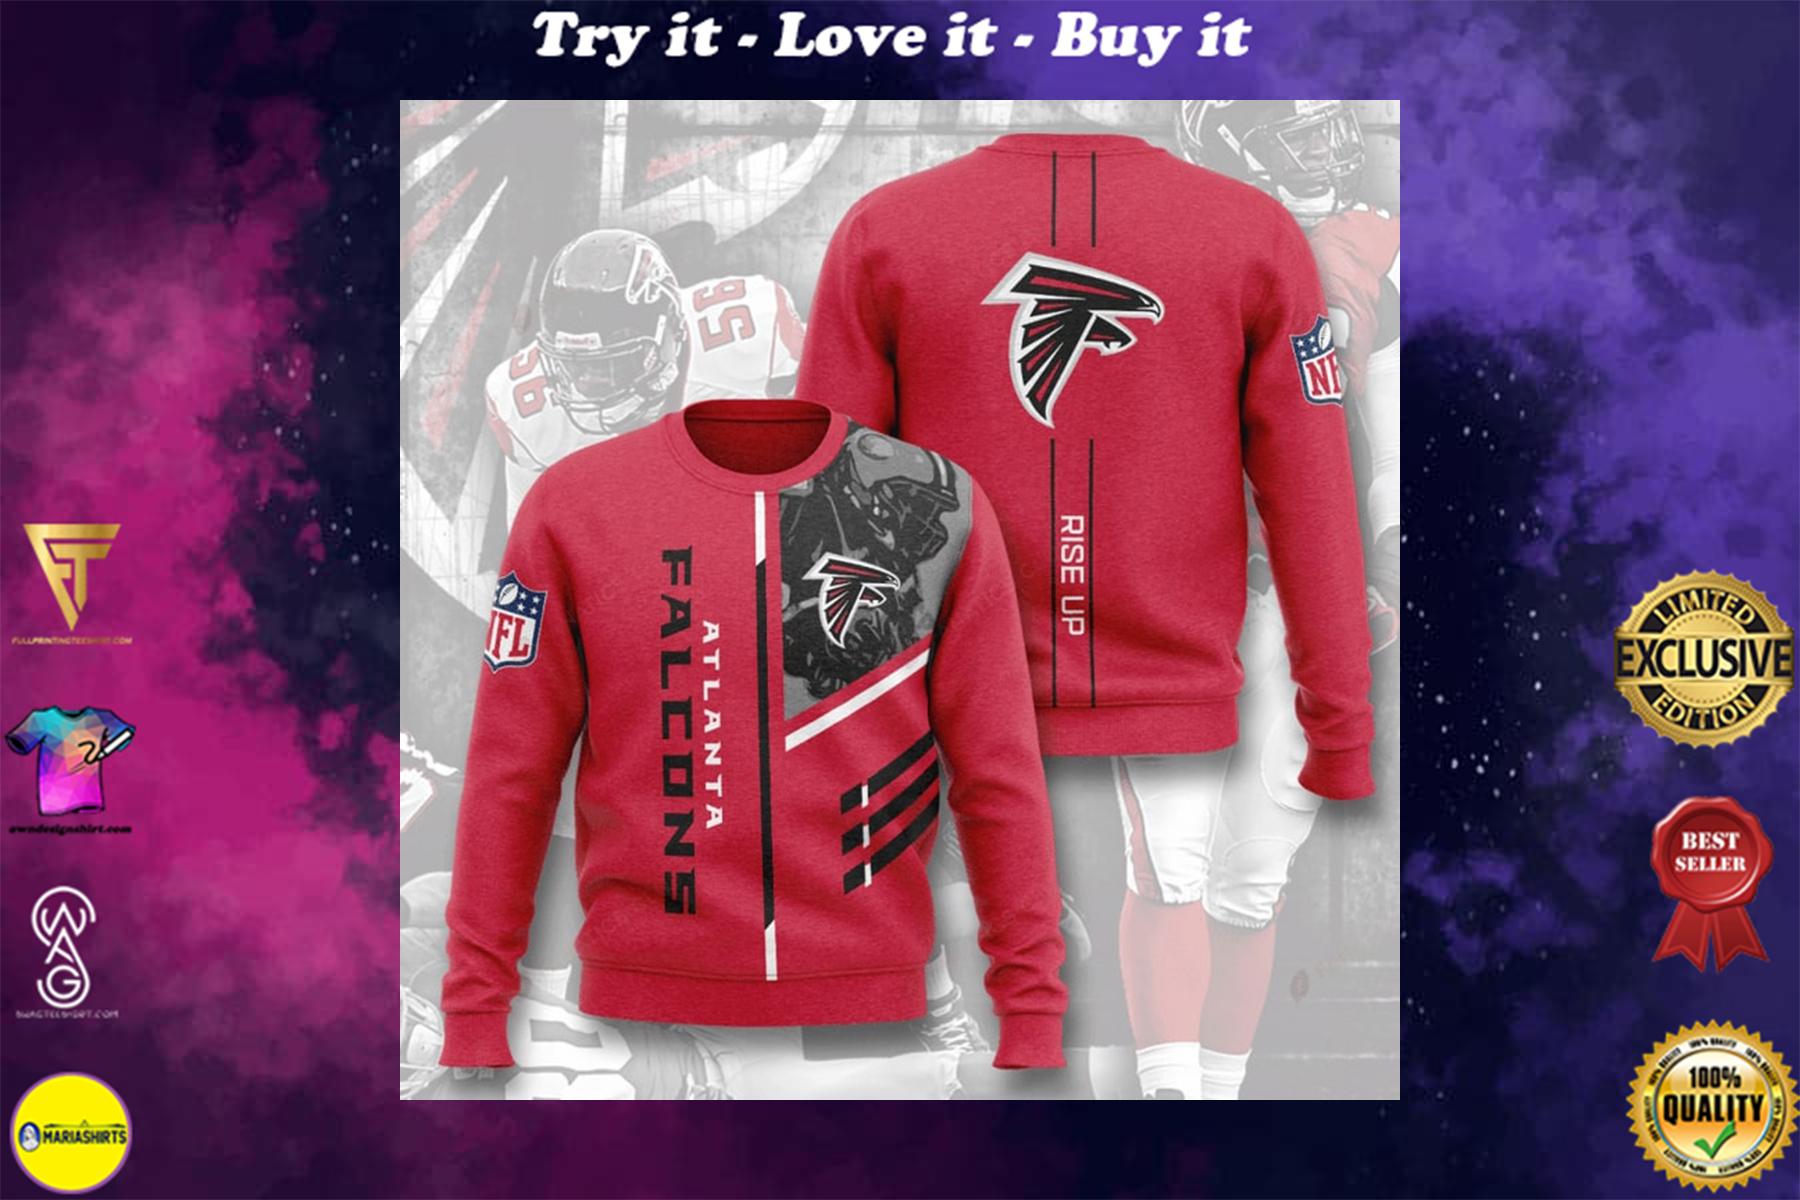 [highest selling] national football league atlanta falcons rise up full printing ugly sweater - maria